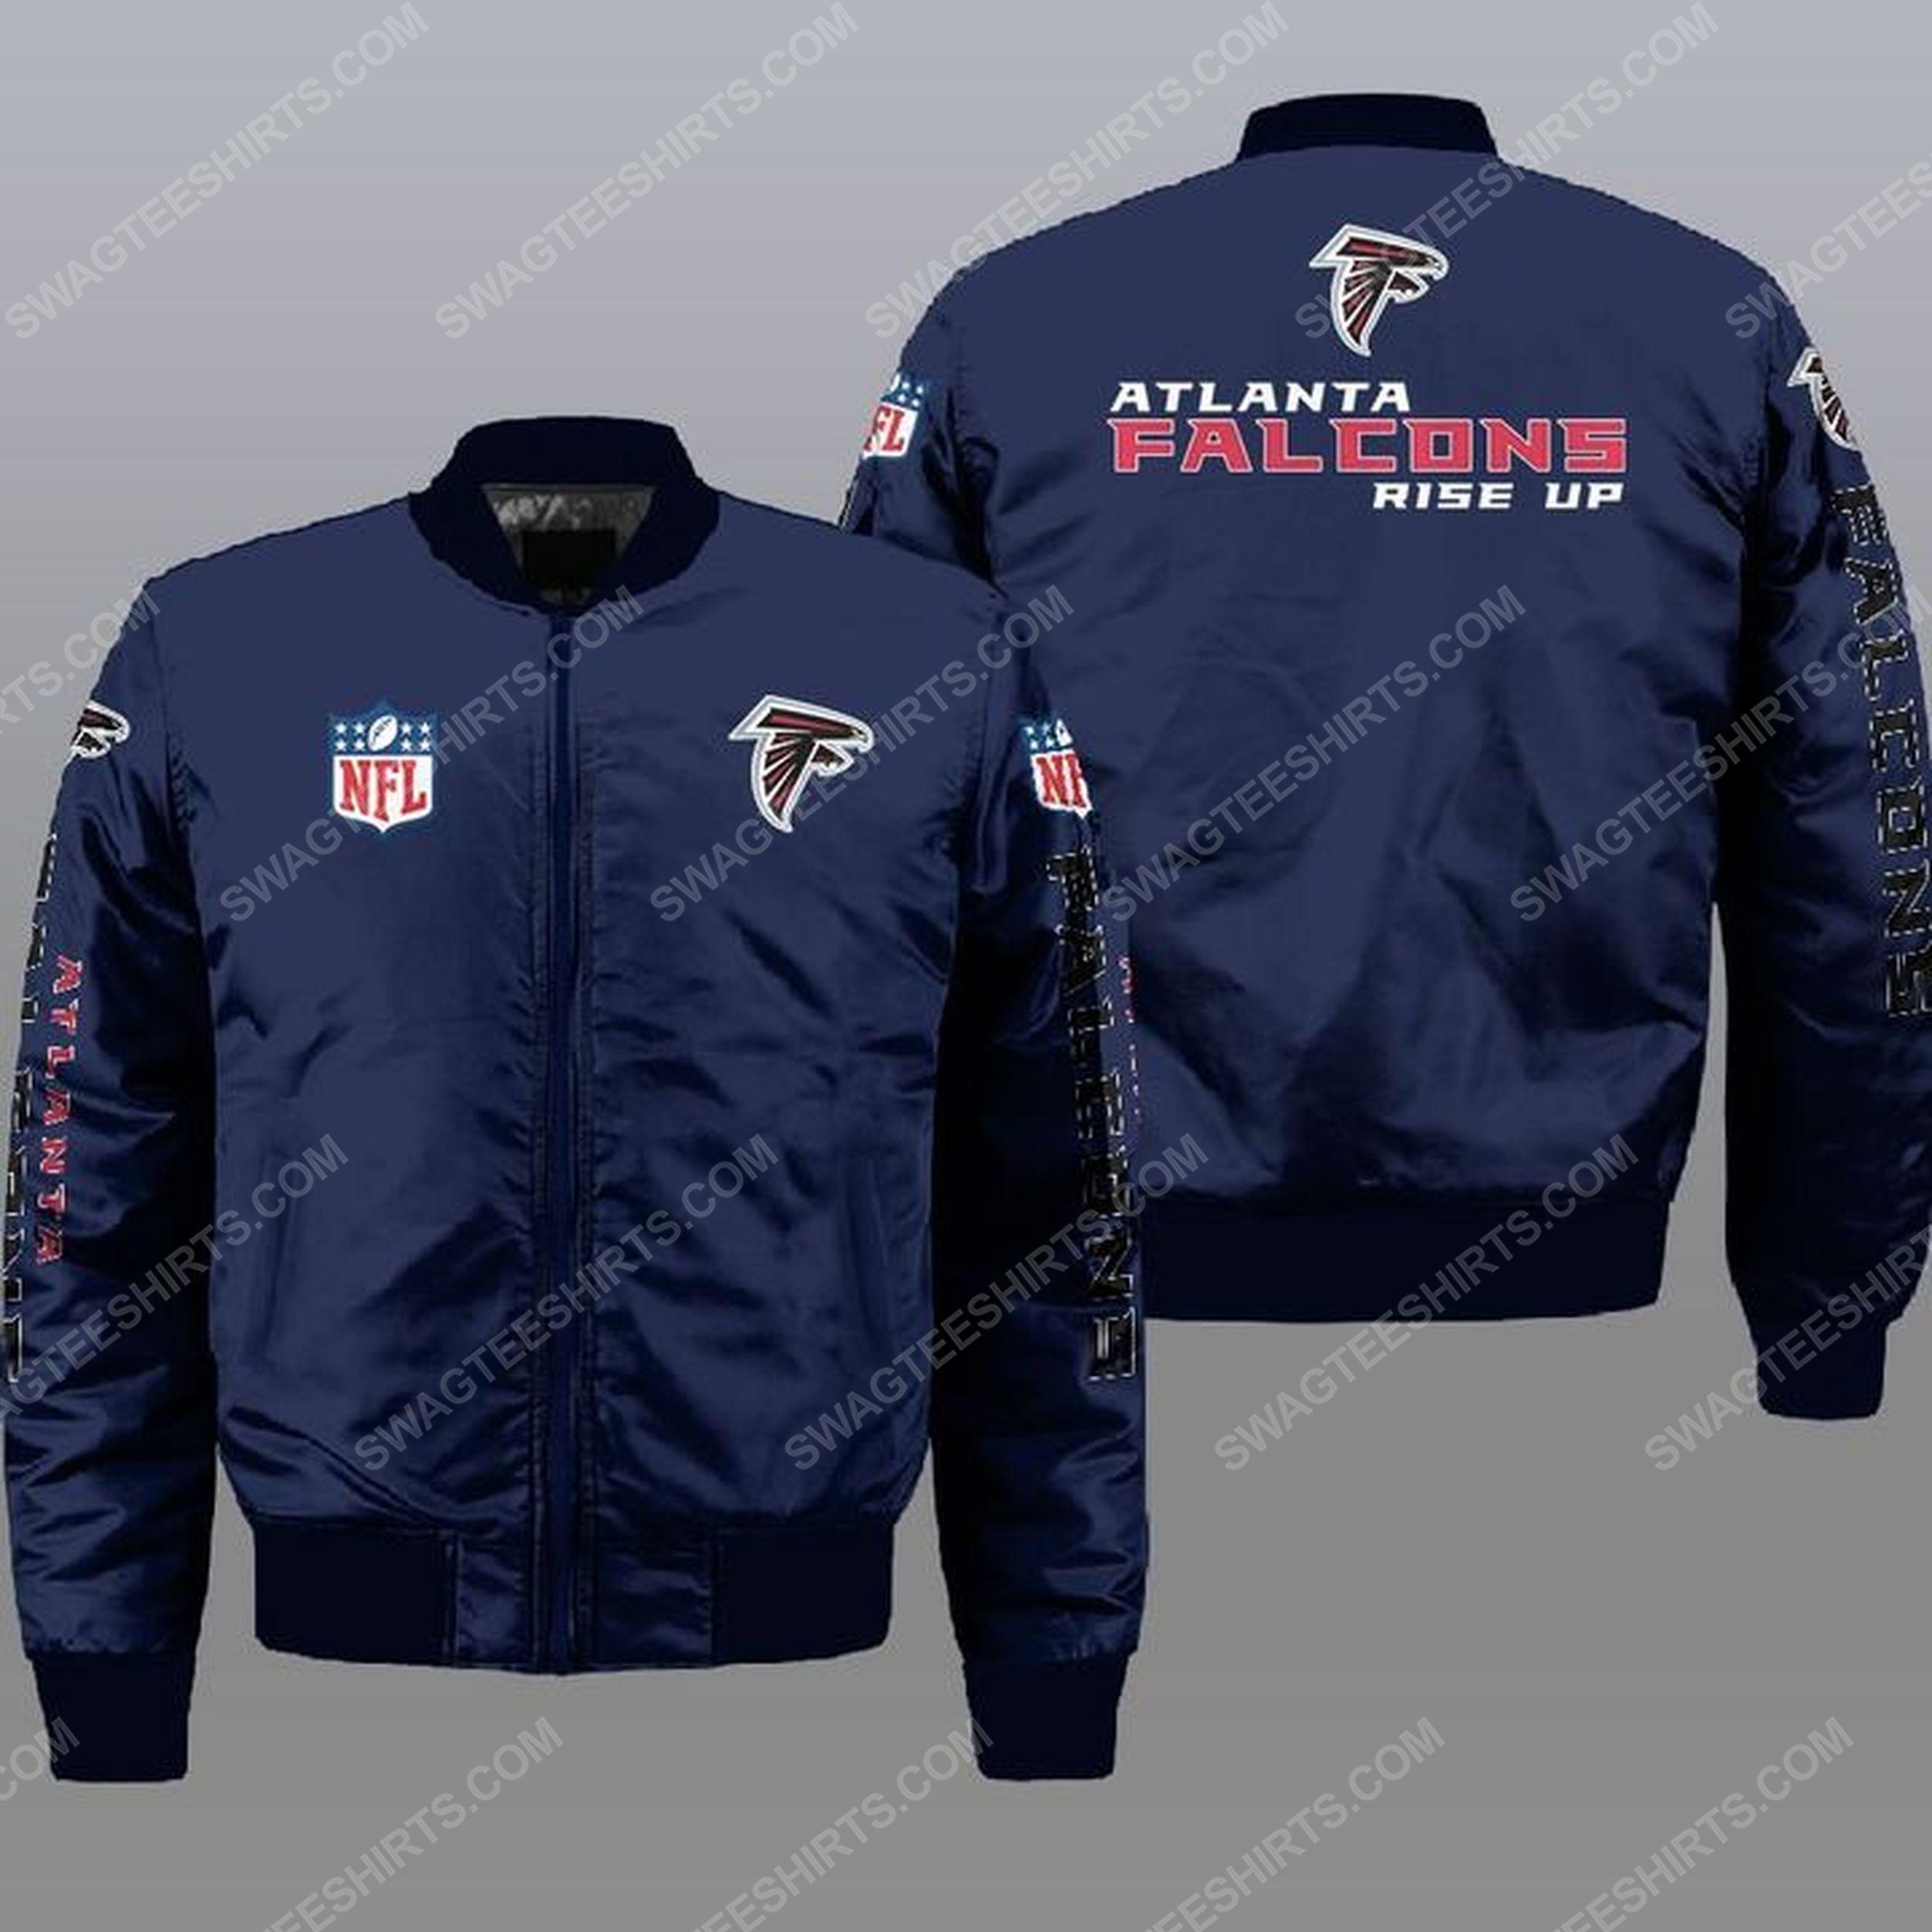 The atlanta falcons rise up all over print bomber jacket -navy 1